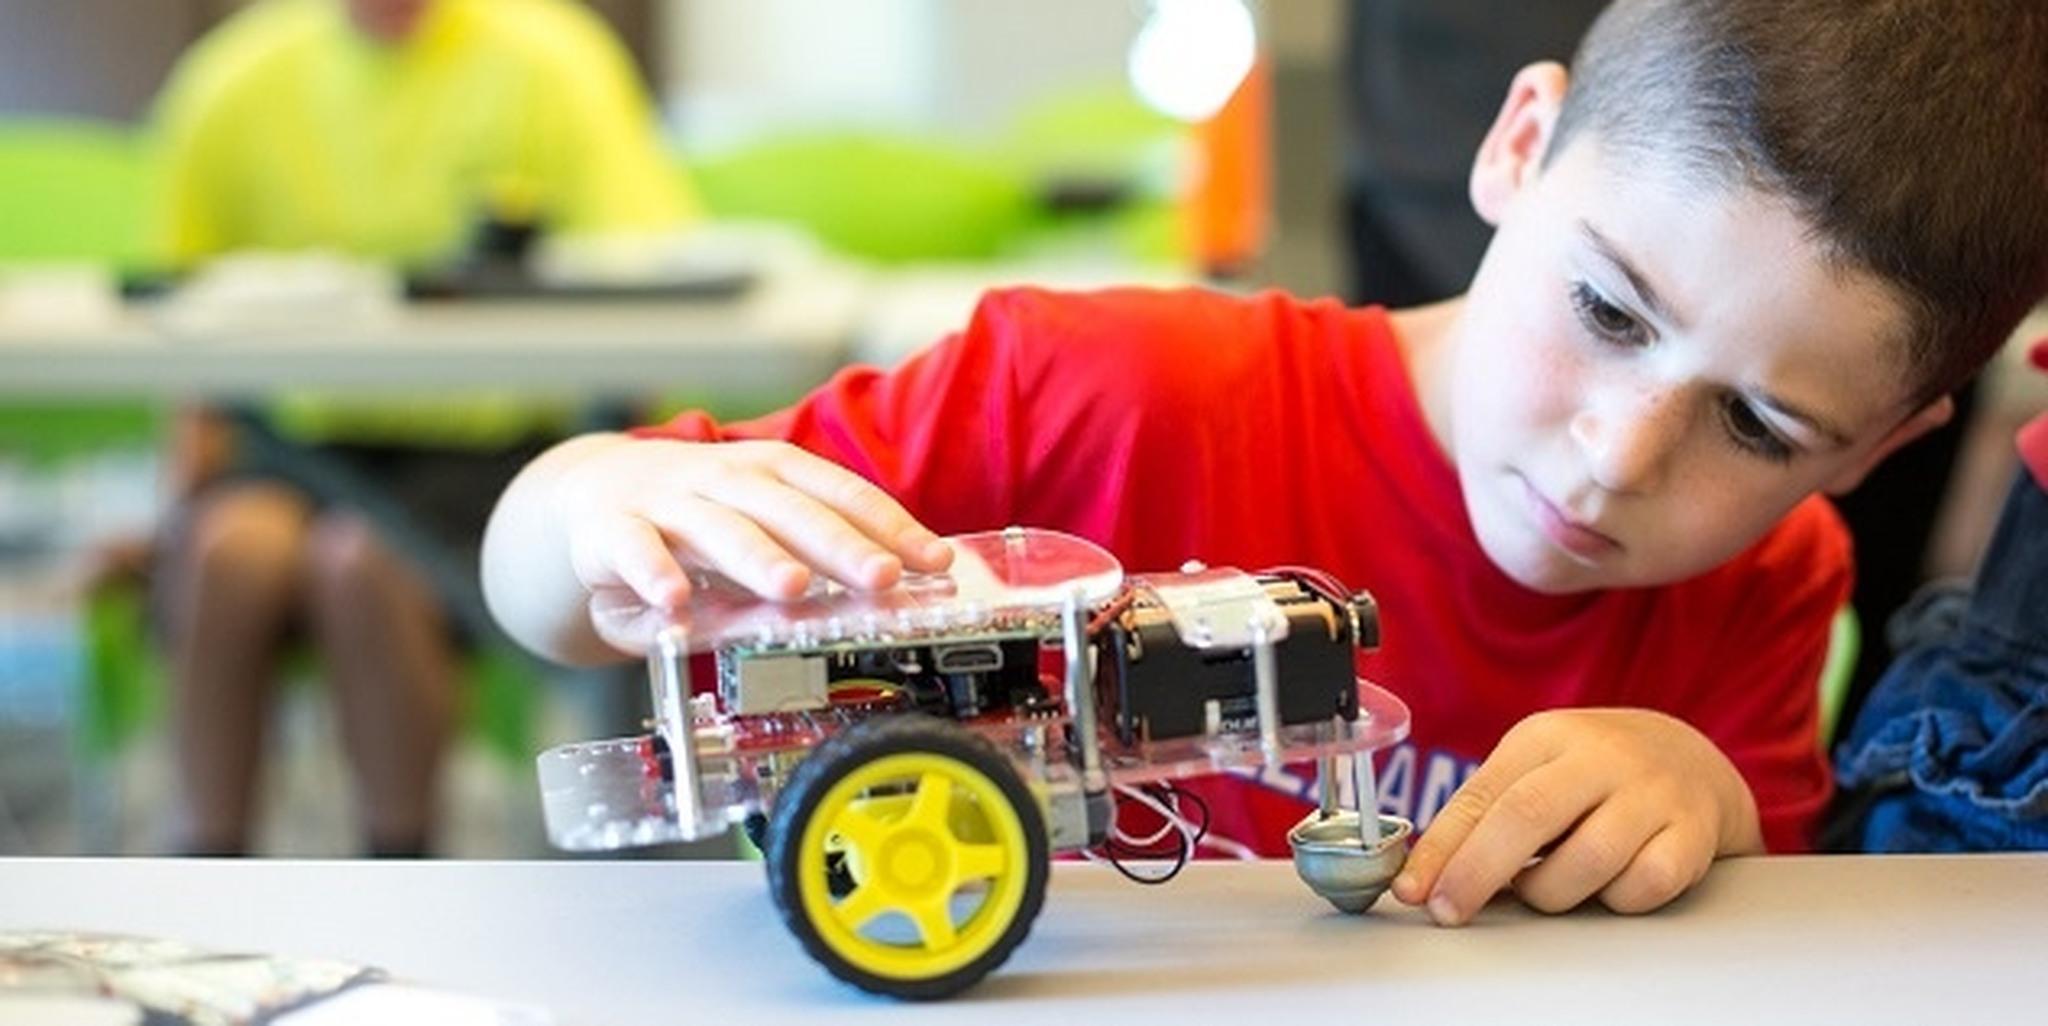 three ways to start robotics child with robot